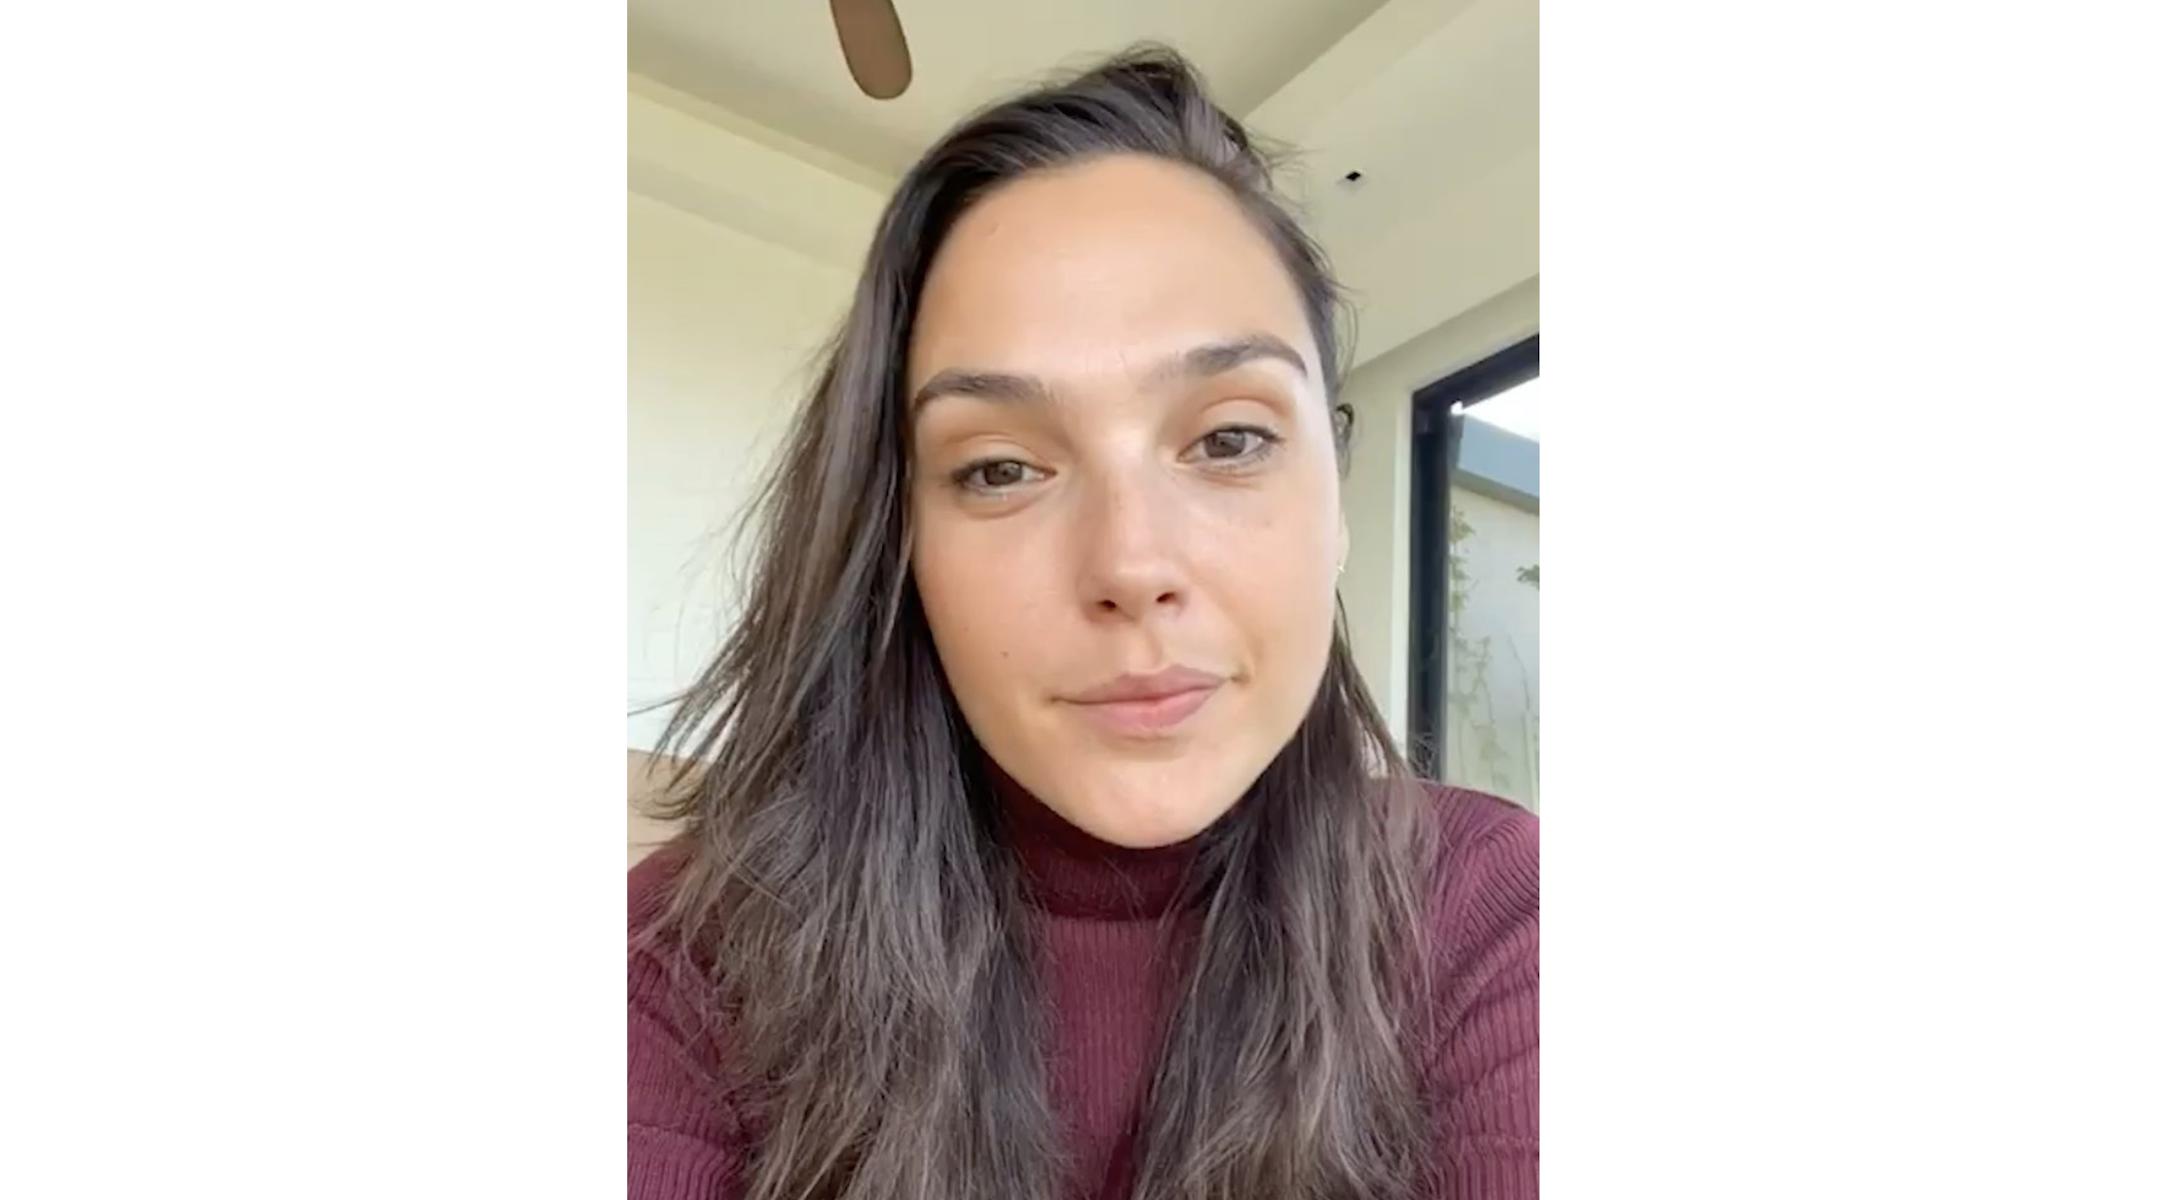 Gal Gadot in a video on her Instagram. (Gal Gadot/Instagram)